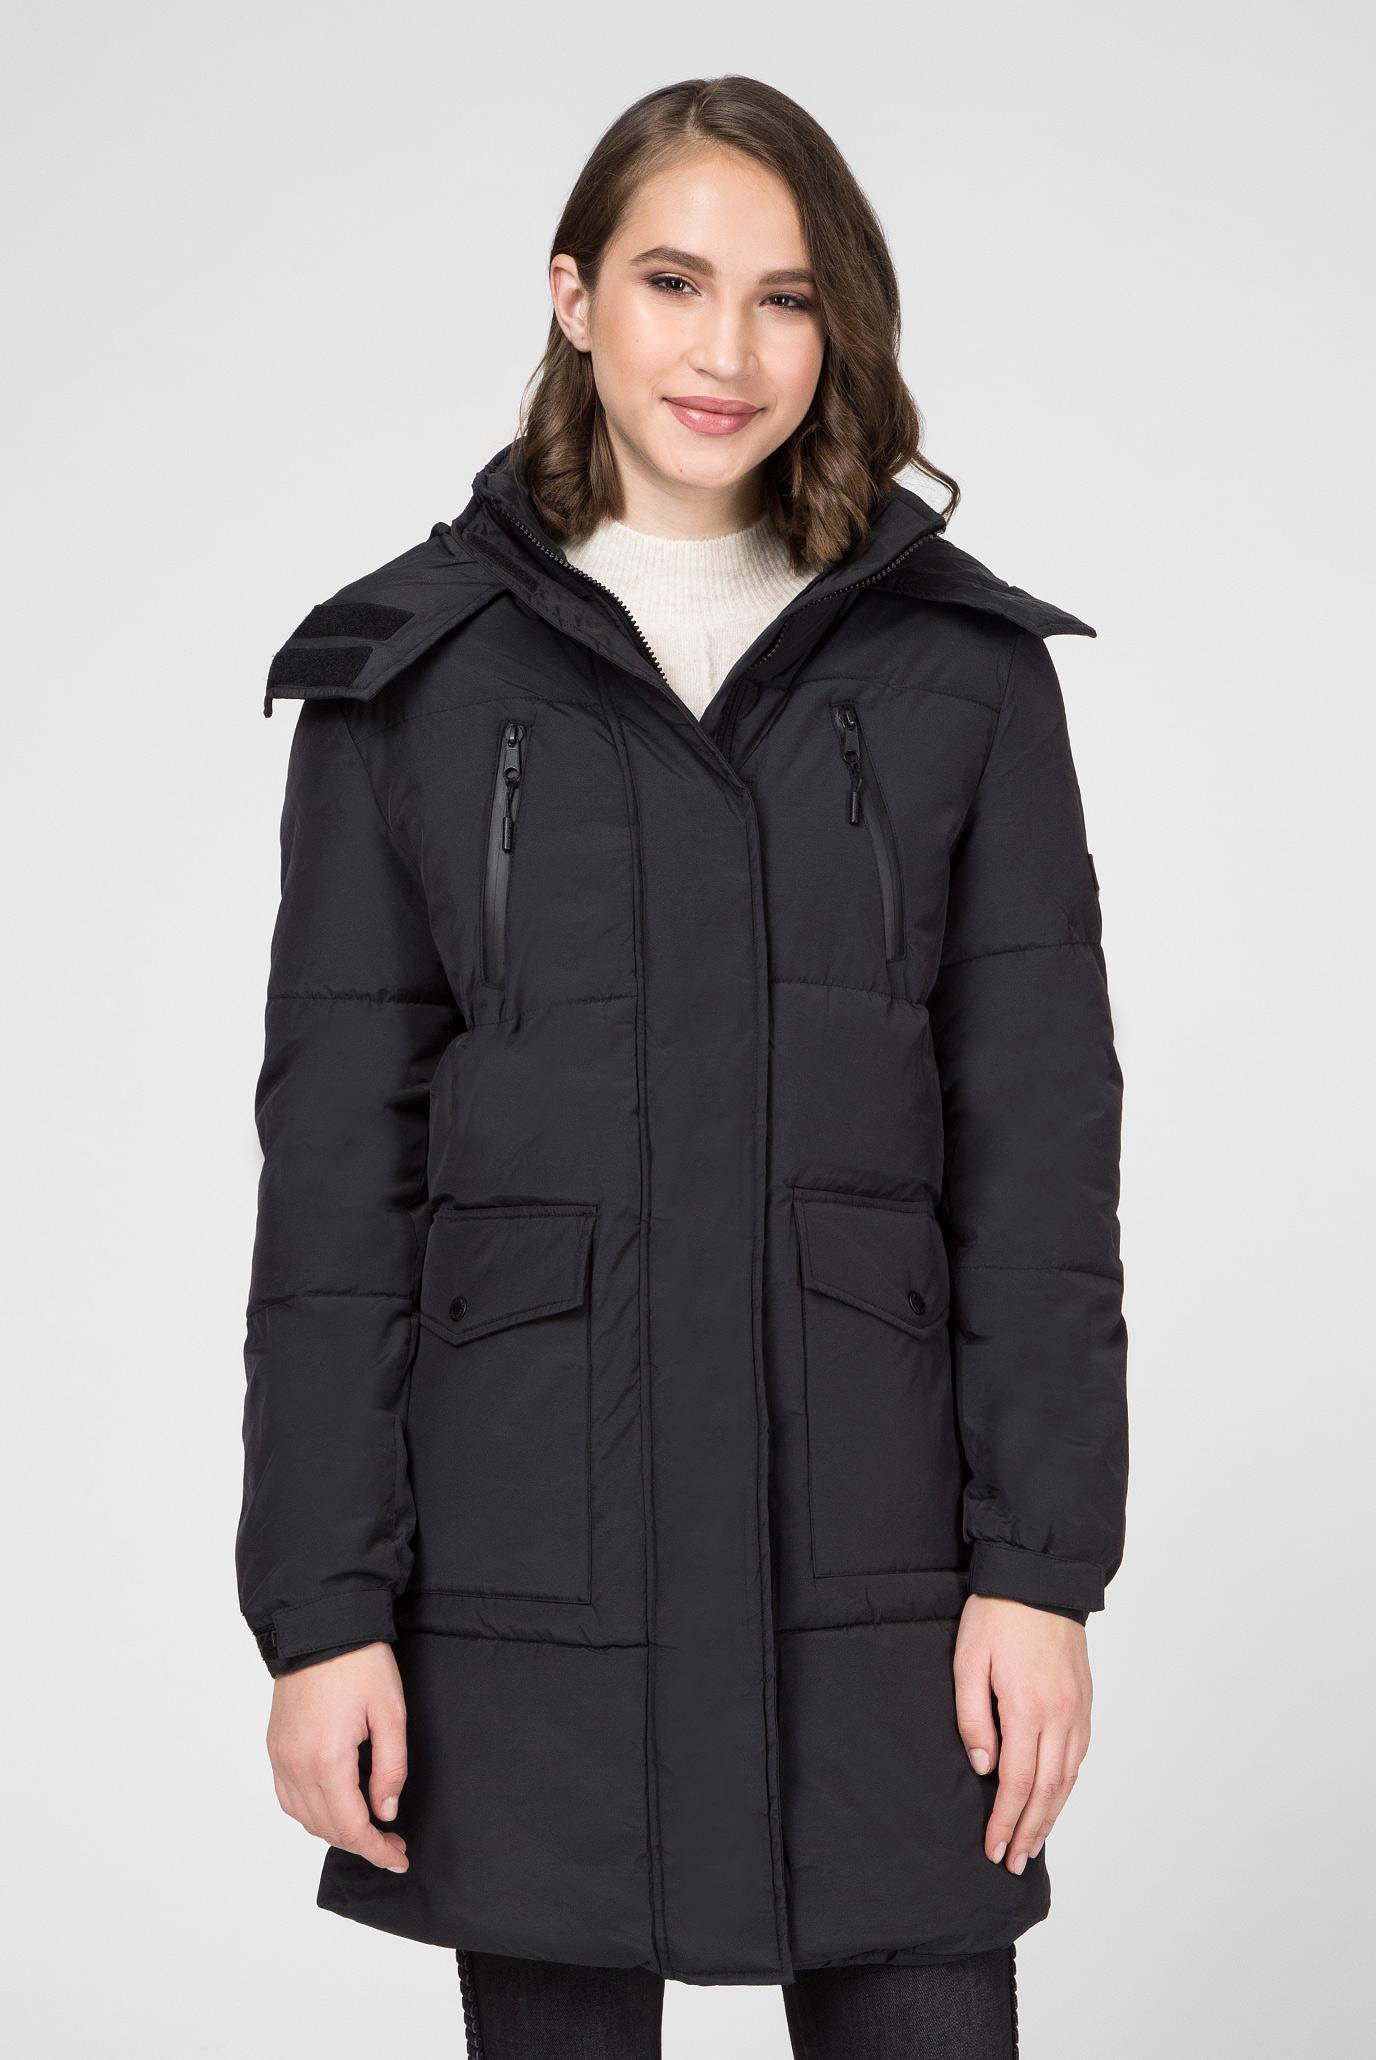 Жіноча чорна подовжена куртка NATT 1